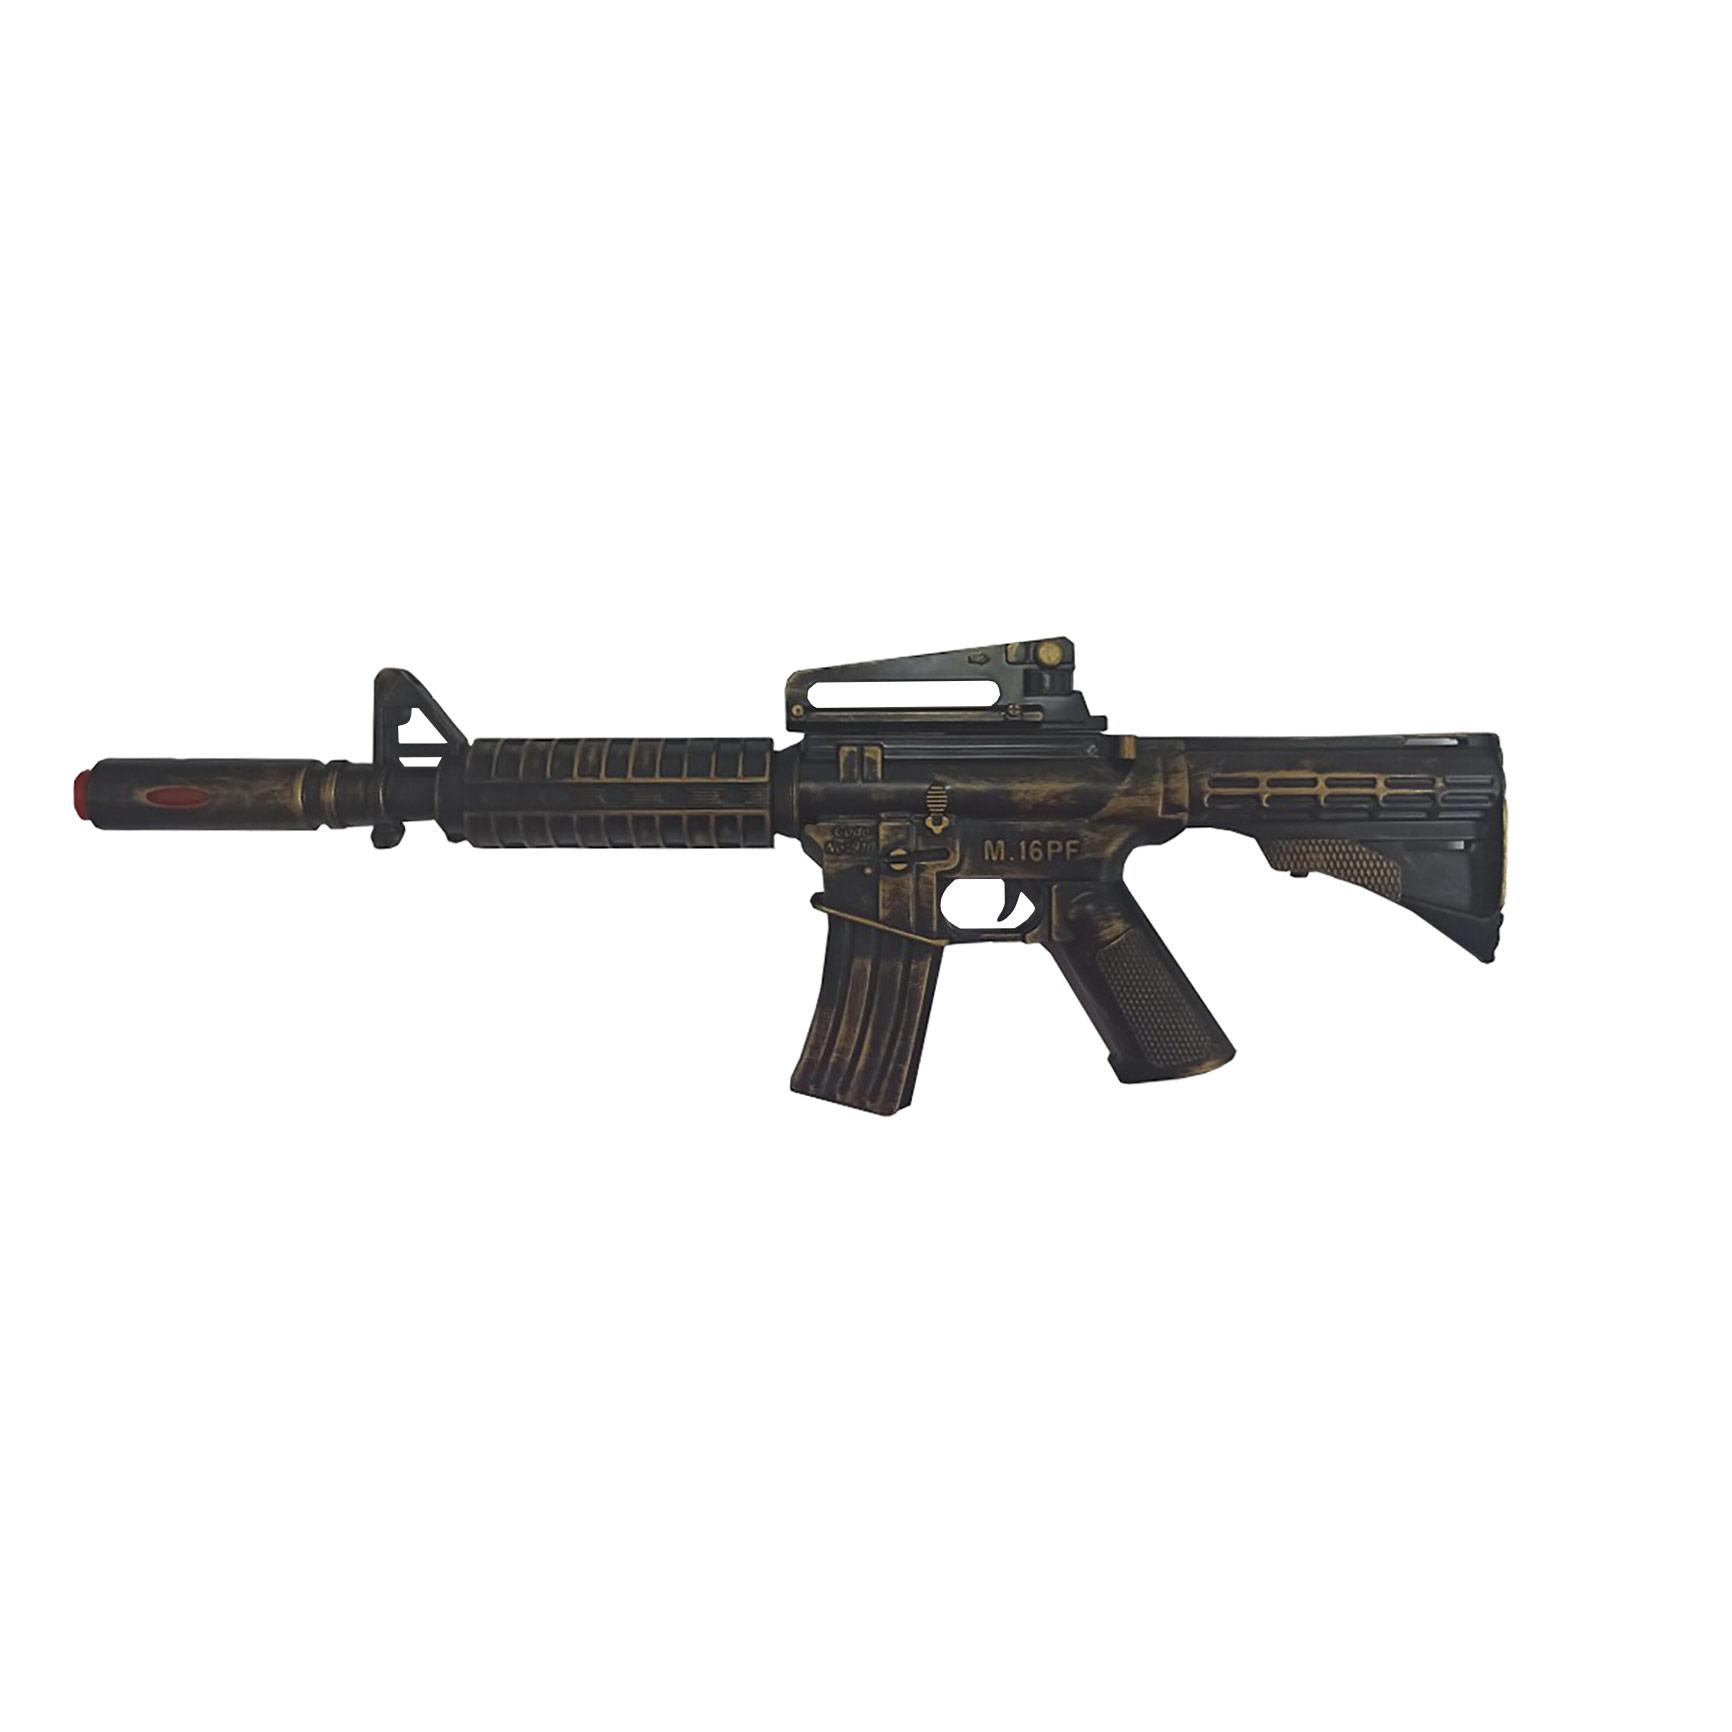 تفنگ بازی گلدن گان مدل naabsell-p10 مجموعه 3 عددی main 1 1